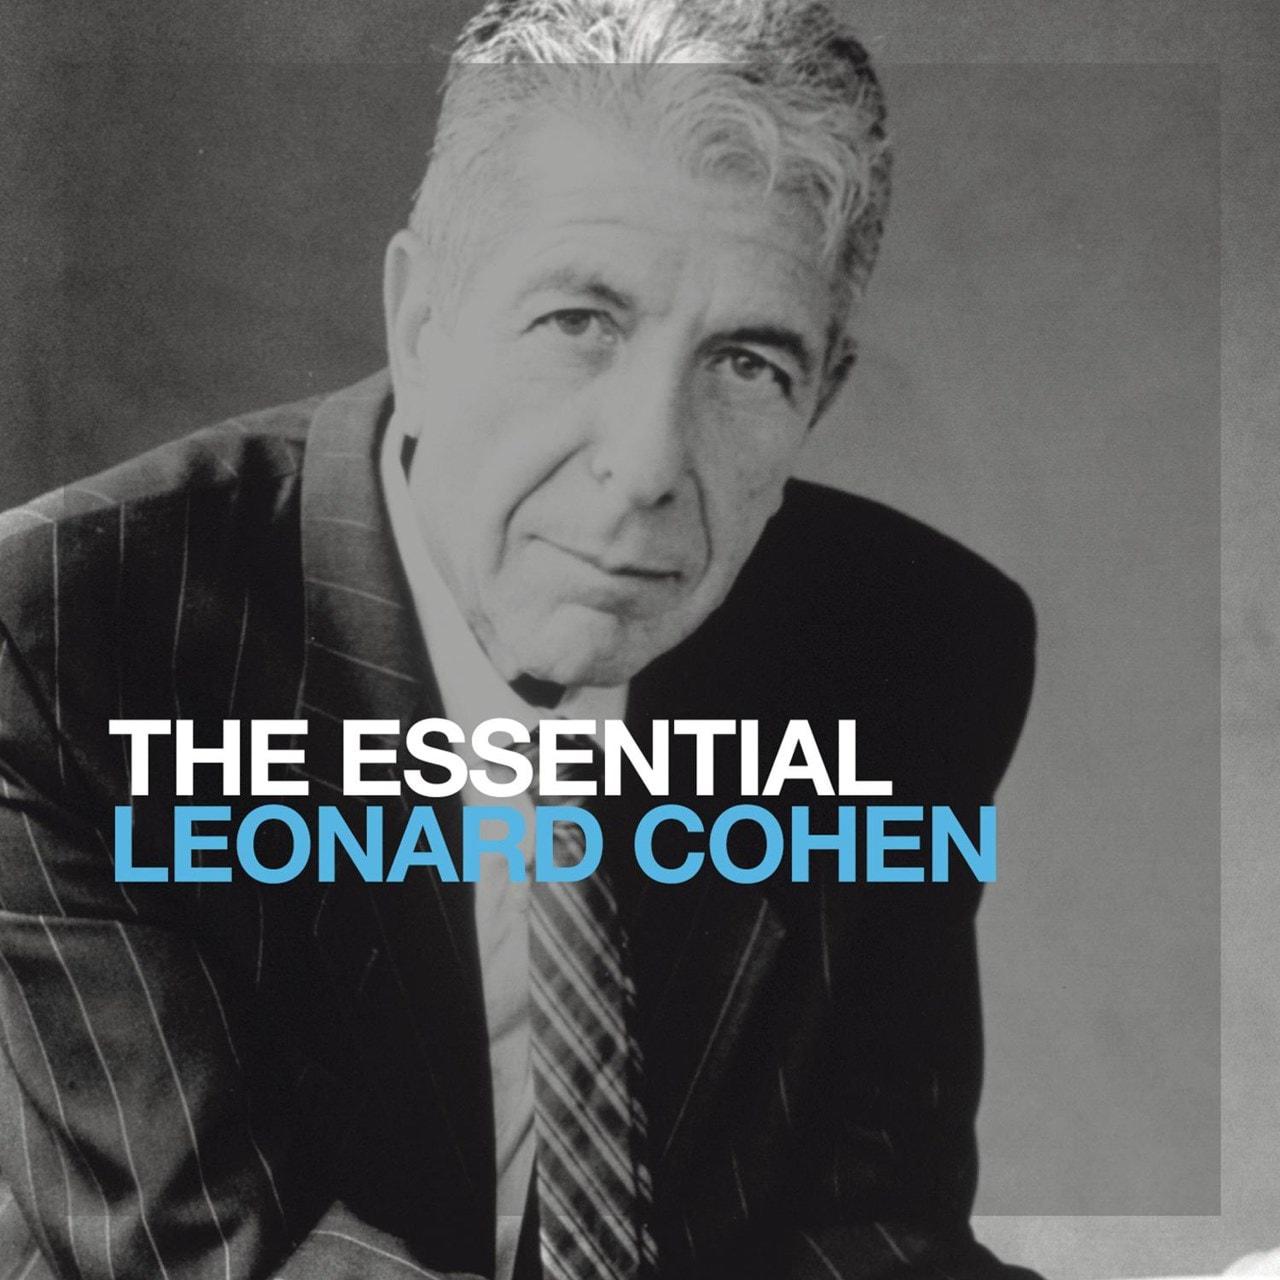 The Essential Leonard Cohen - 1